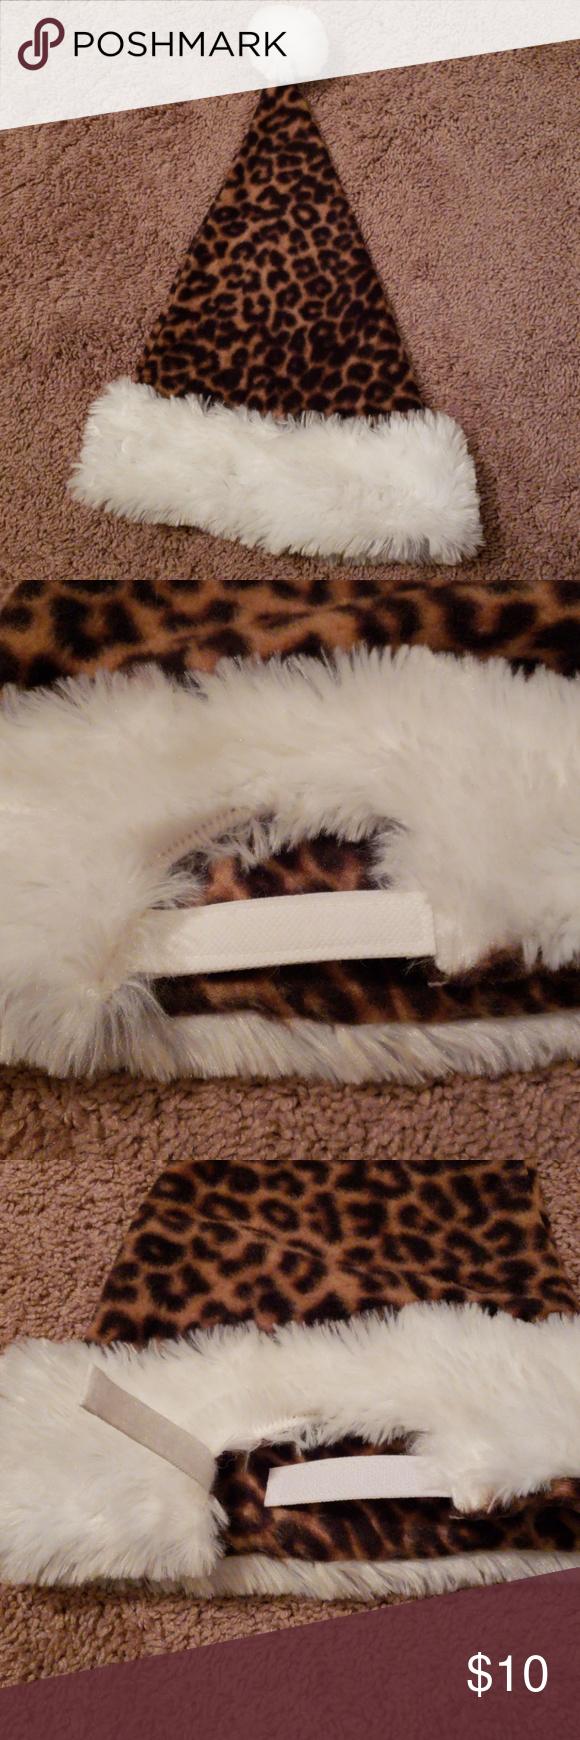 b0ae0121e67c2 🎅🤶🐆🐾 Fleece leopard print santa hat Fleece with puffy ball on ...